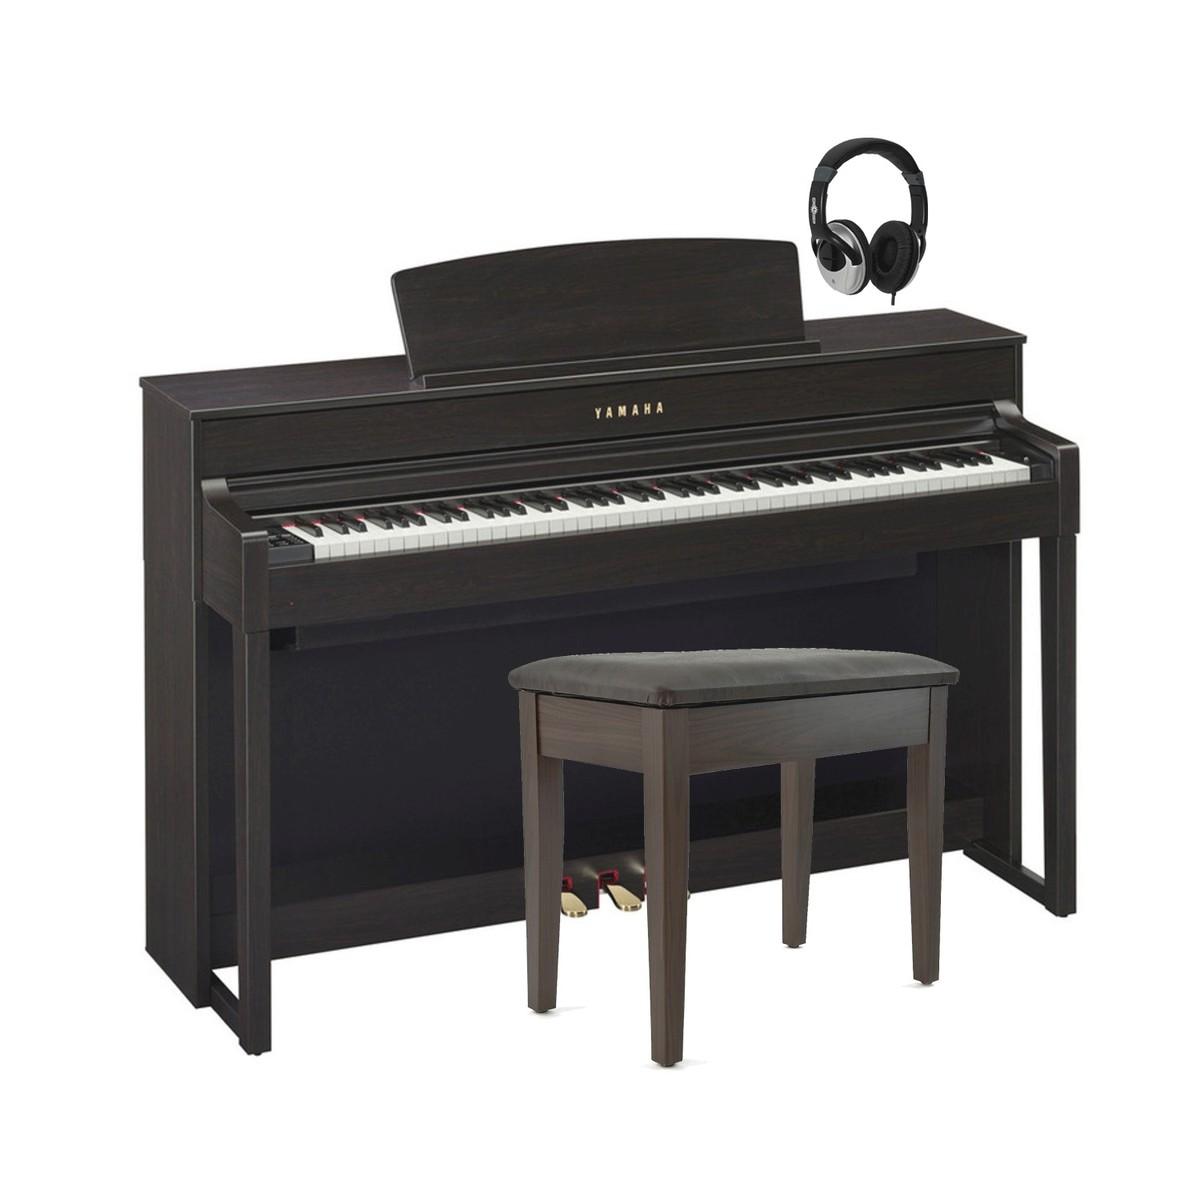 Yamaha clp575 clavinova digital piano rosewood package for Yamaha digital piano clavinova